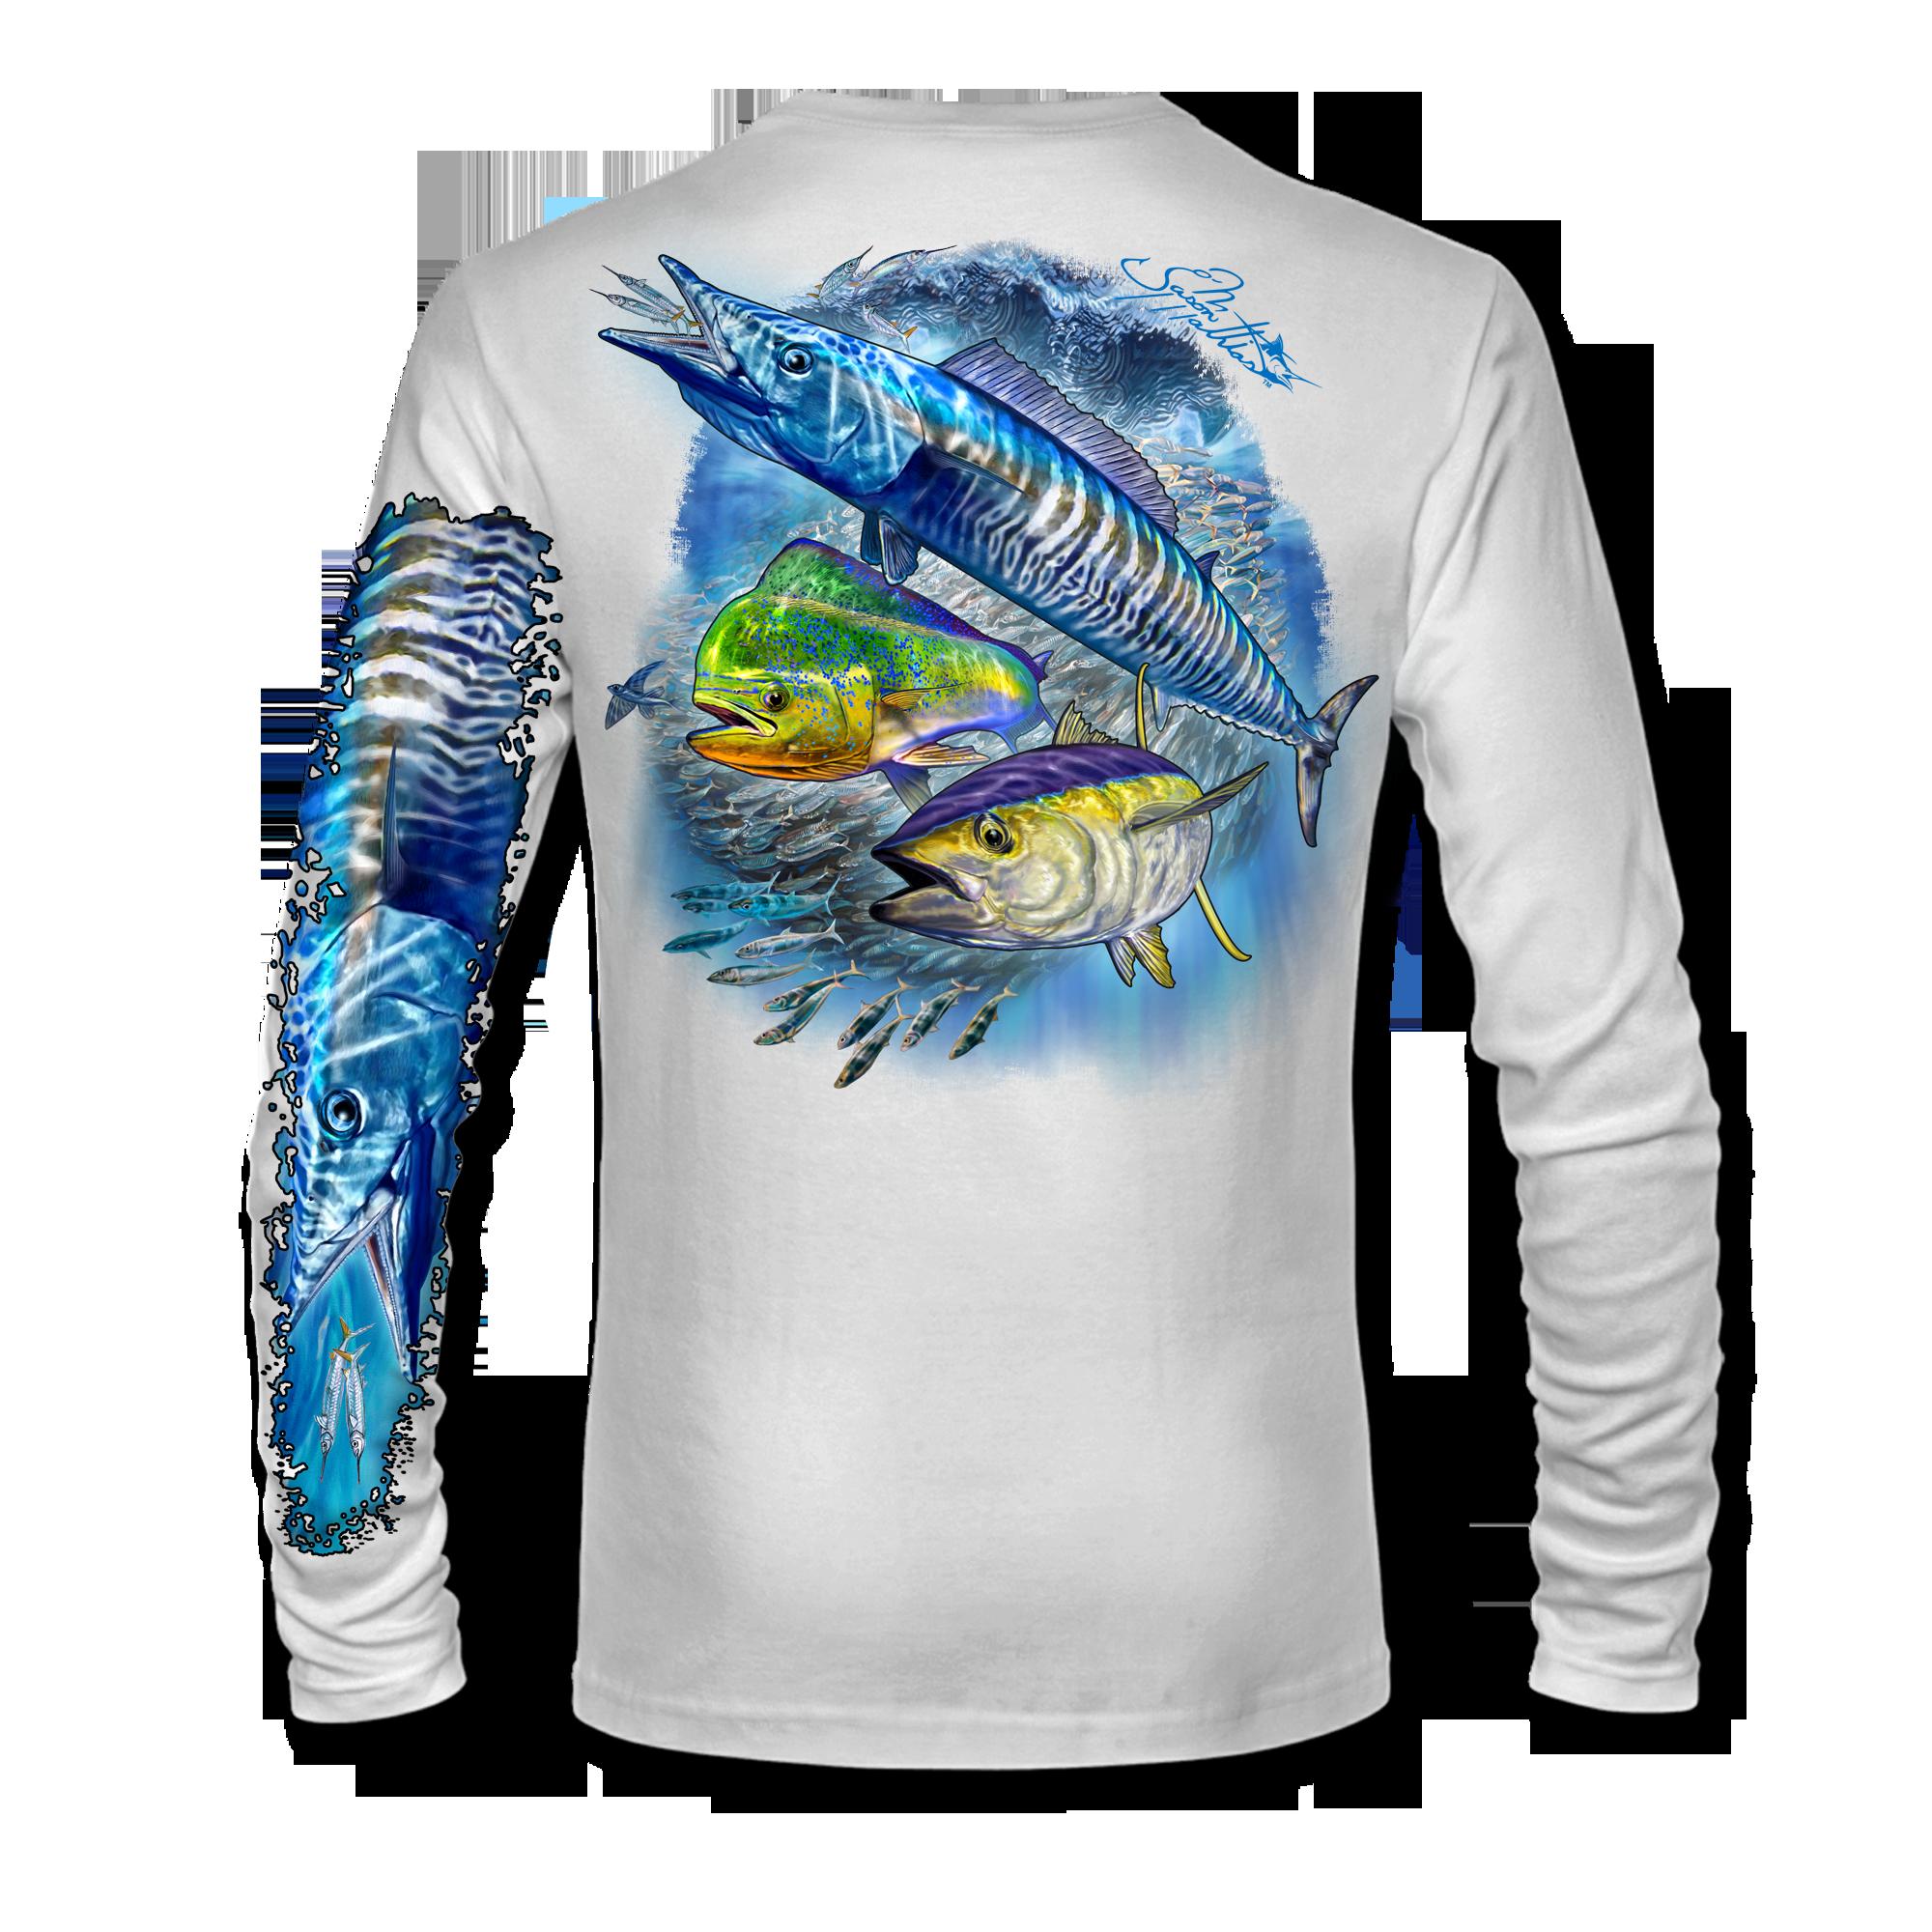 jason-mathias-wahoo-mahi-tuna-shirt-white.png